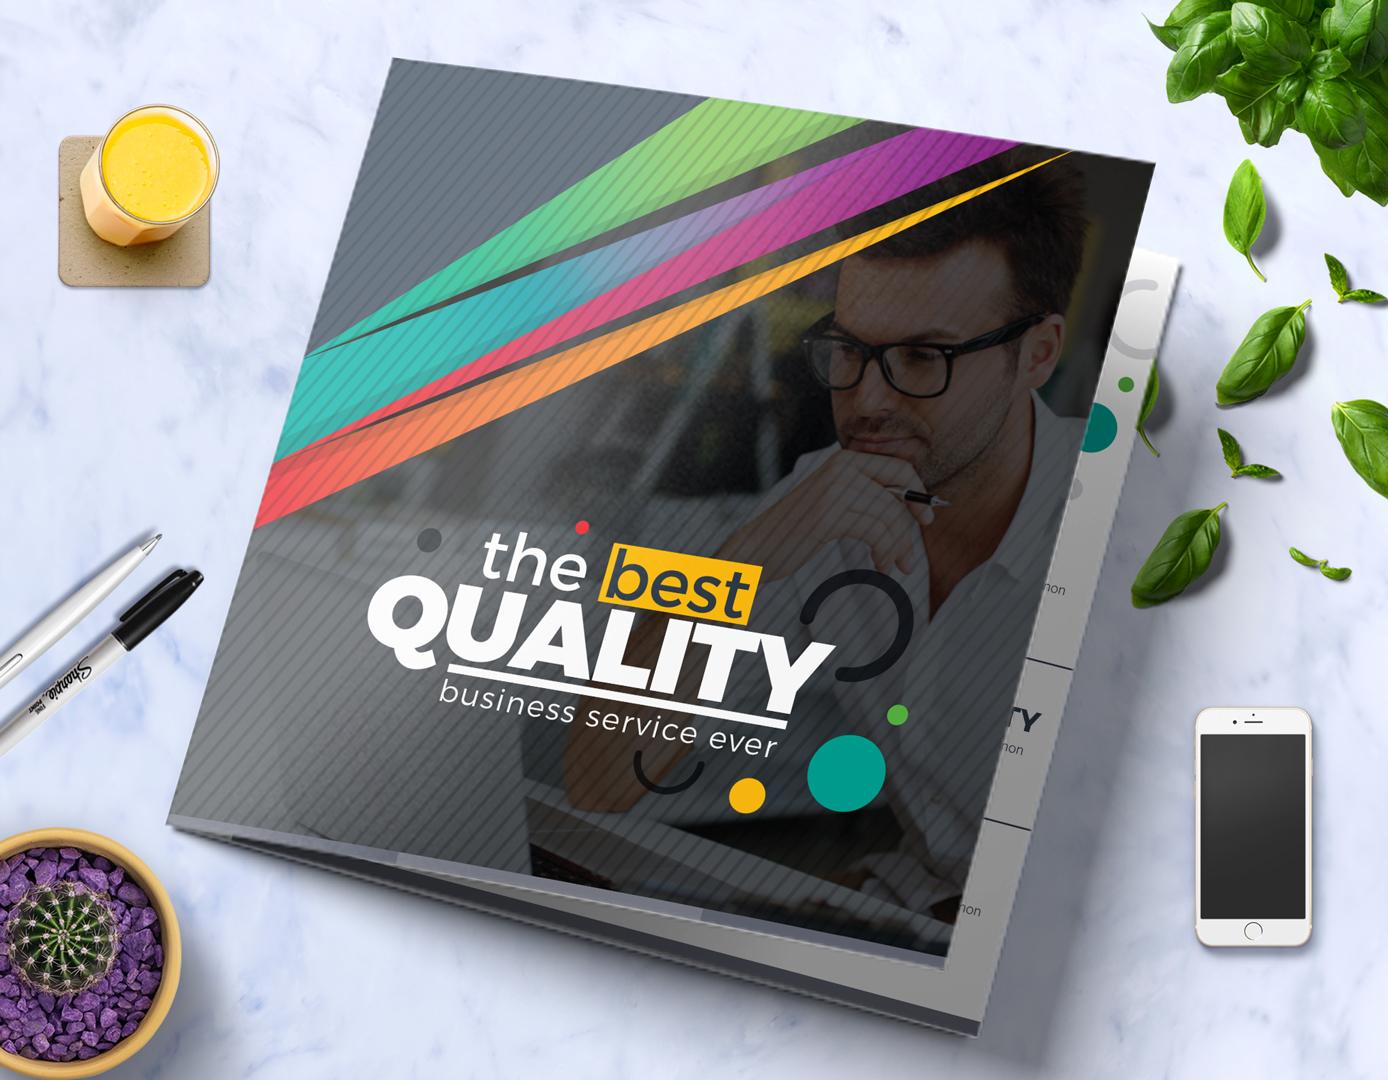 Tri-Fold Brochure Design Template : Square and Tall Version Corporate Identity